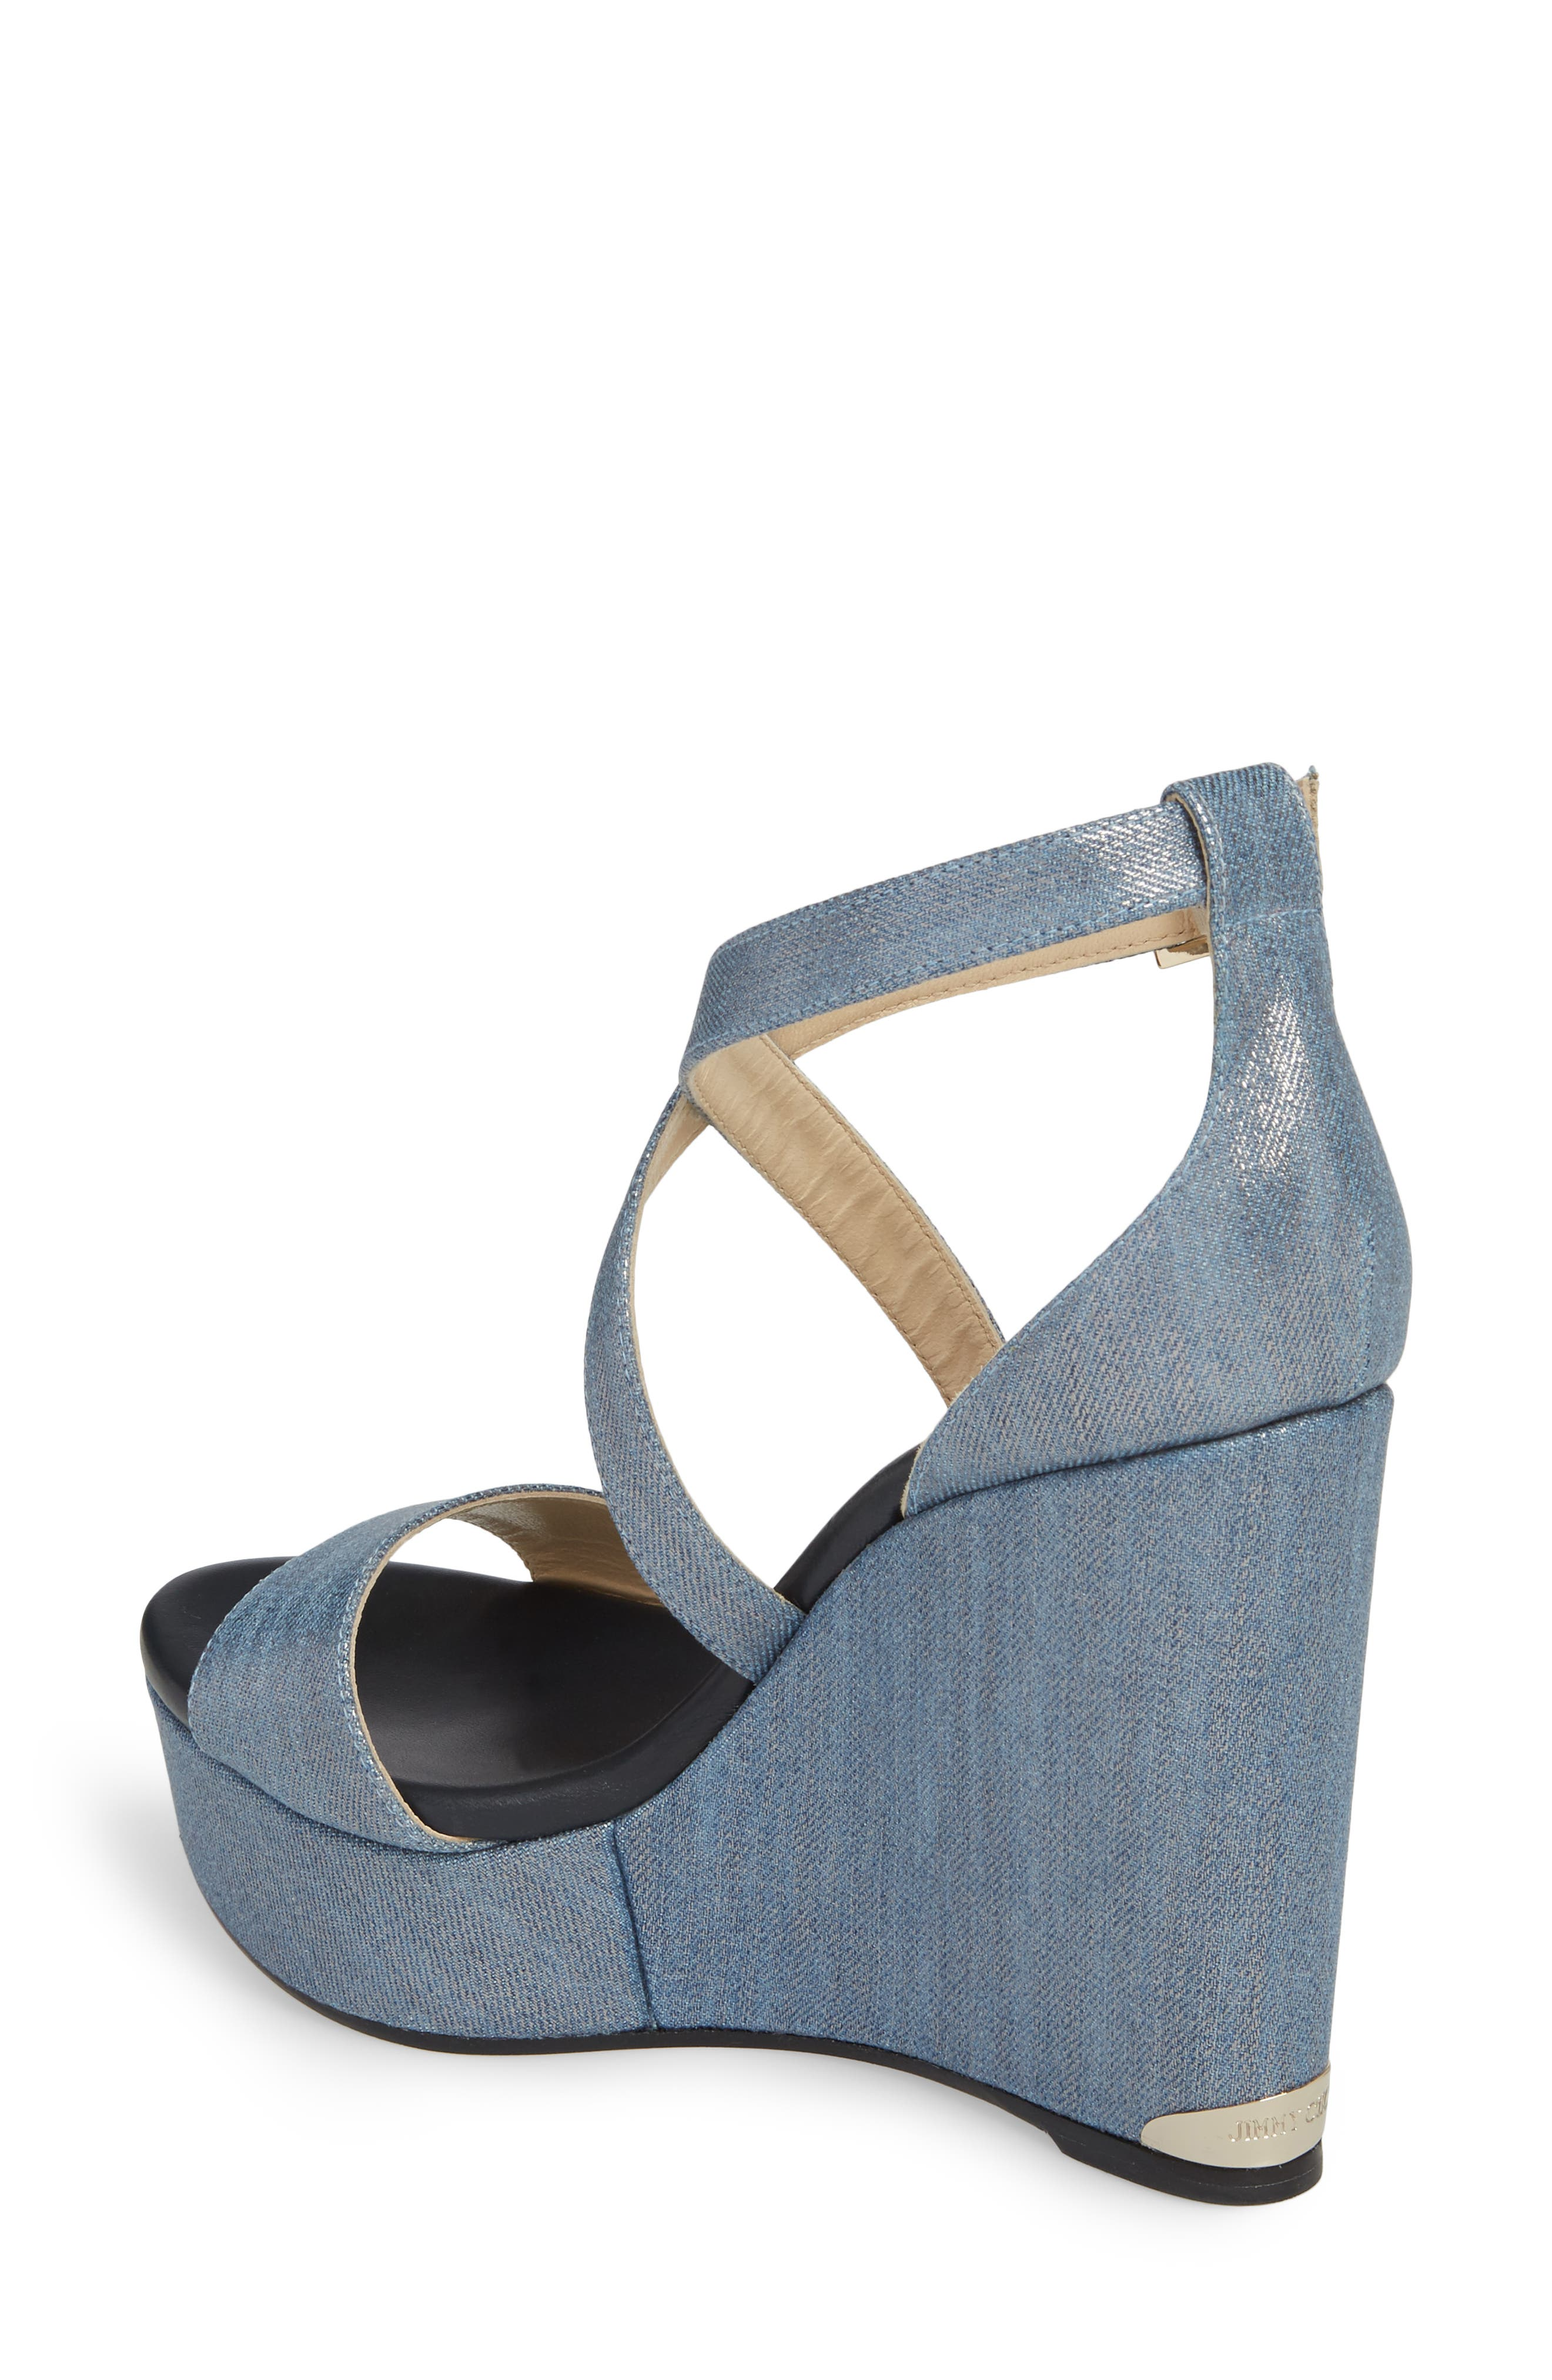 Portia Platform Wedge Sandal,                             Alternate thumbnail 2, color,                             Dusk Blue